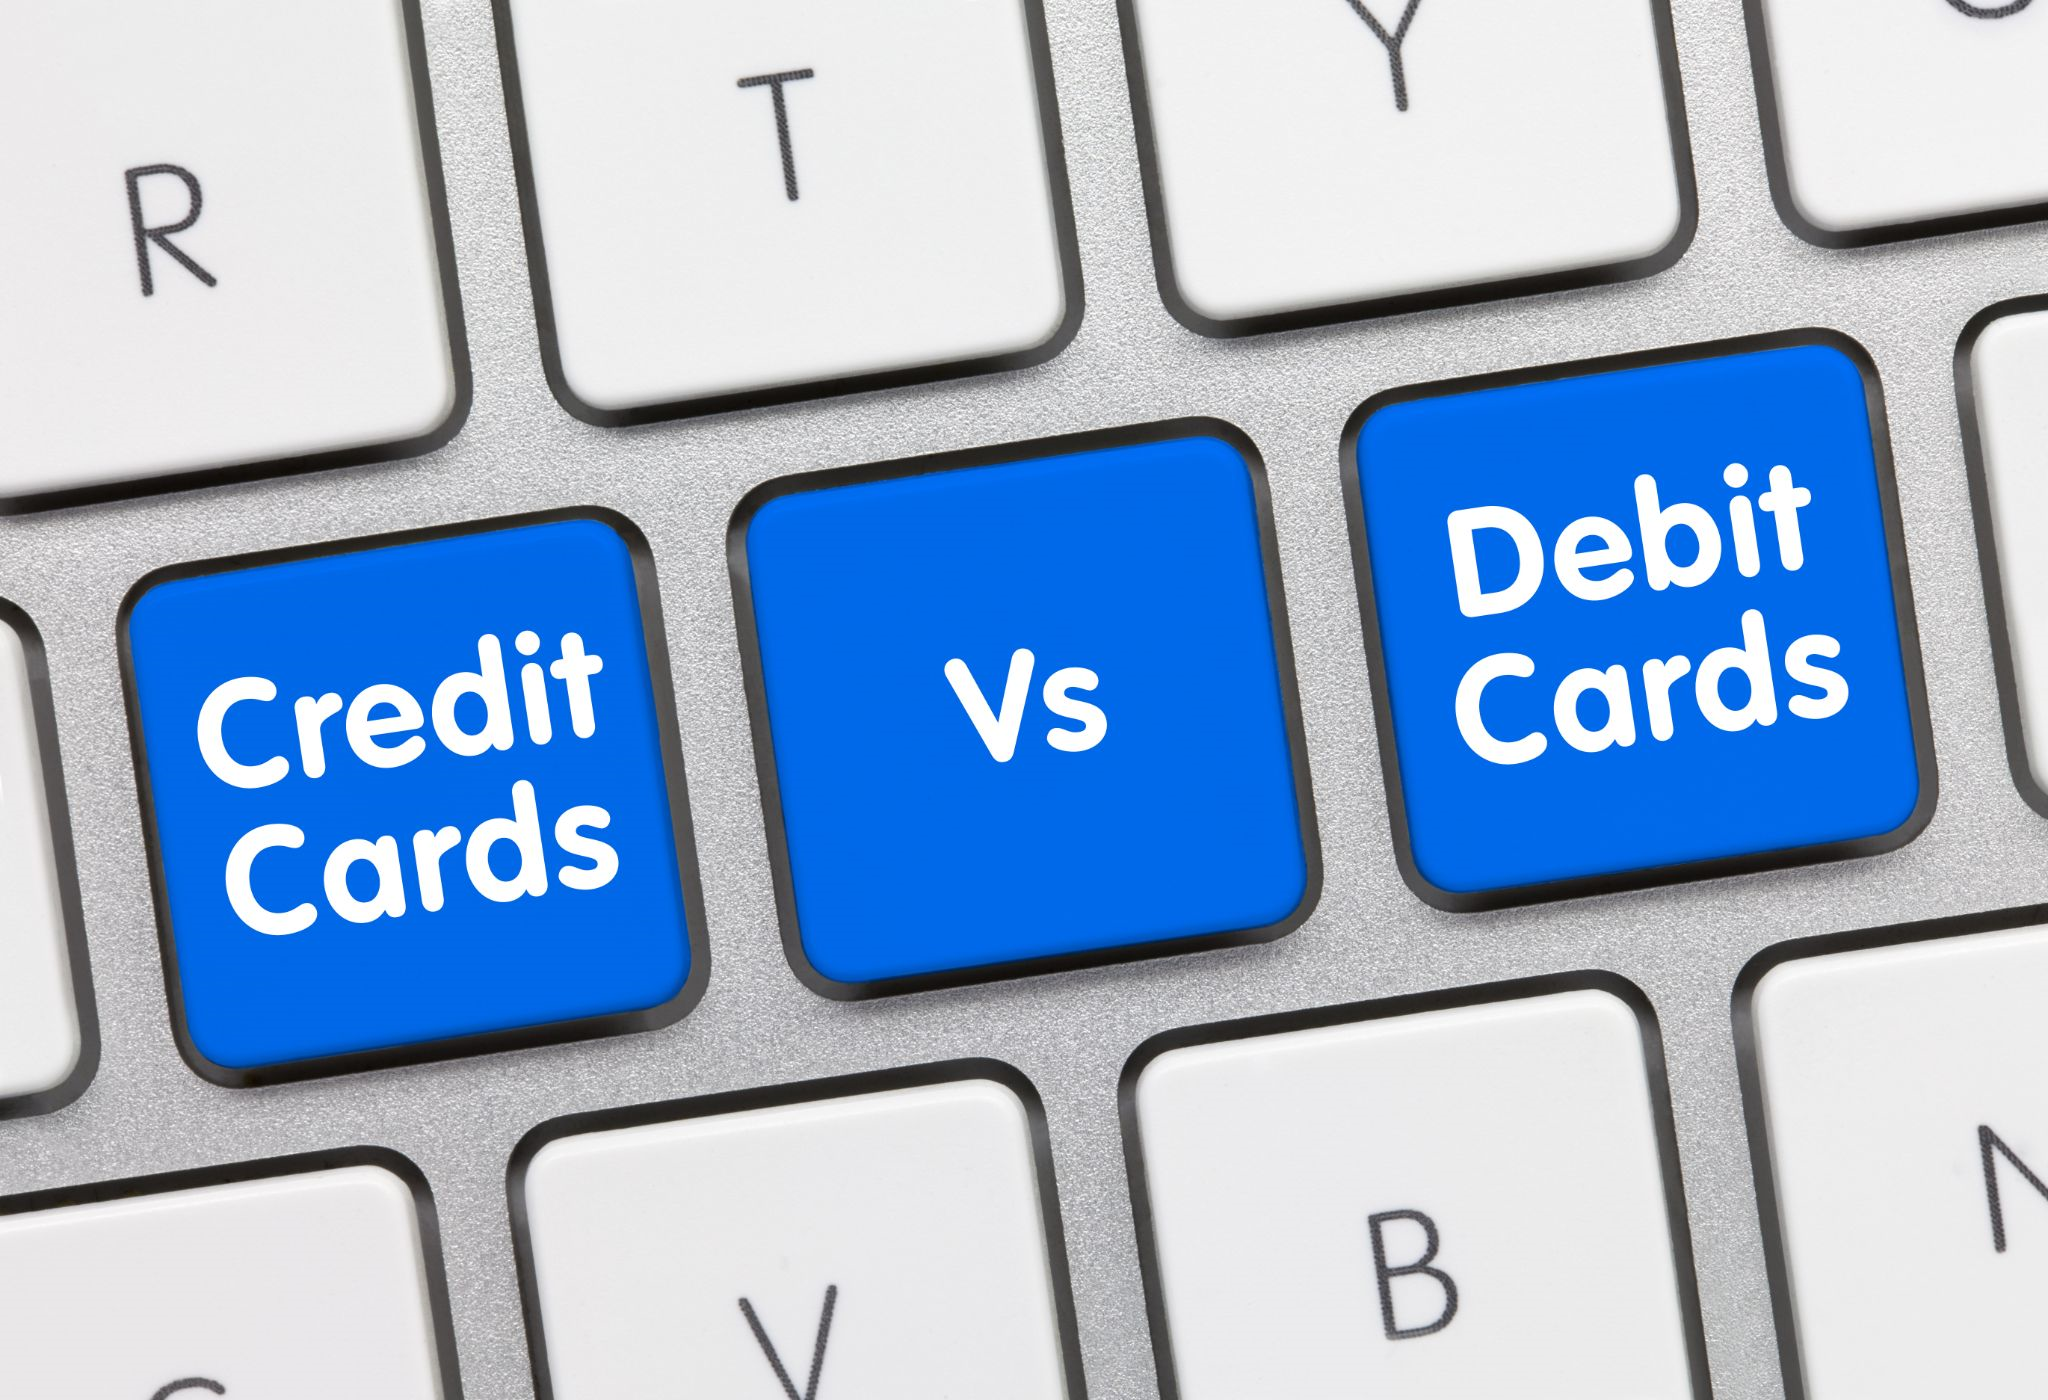 Computer Keyboard with Credit Card vs Debt Card written on keys